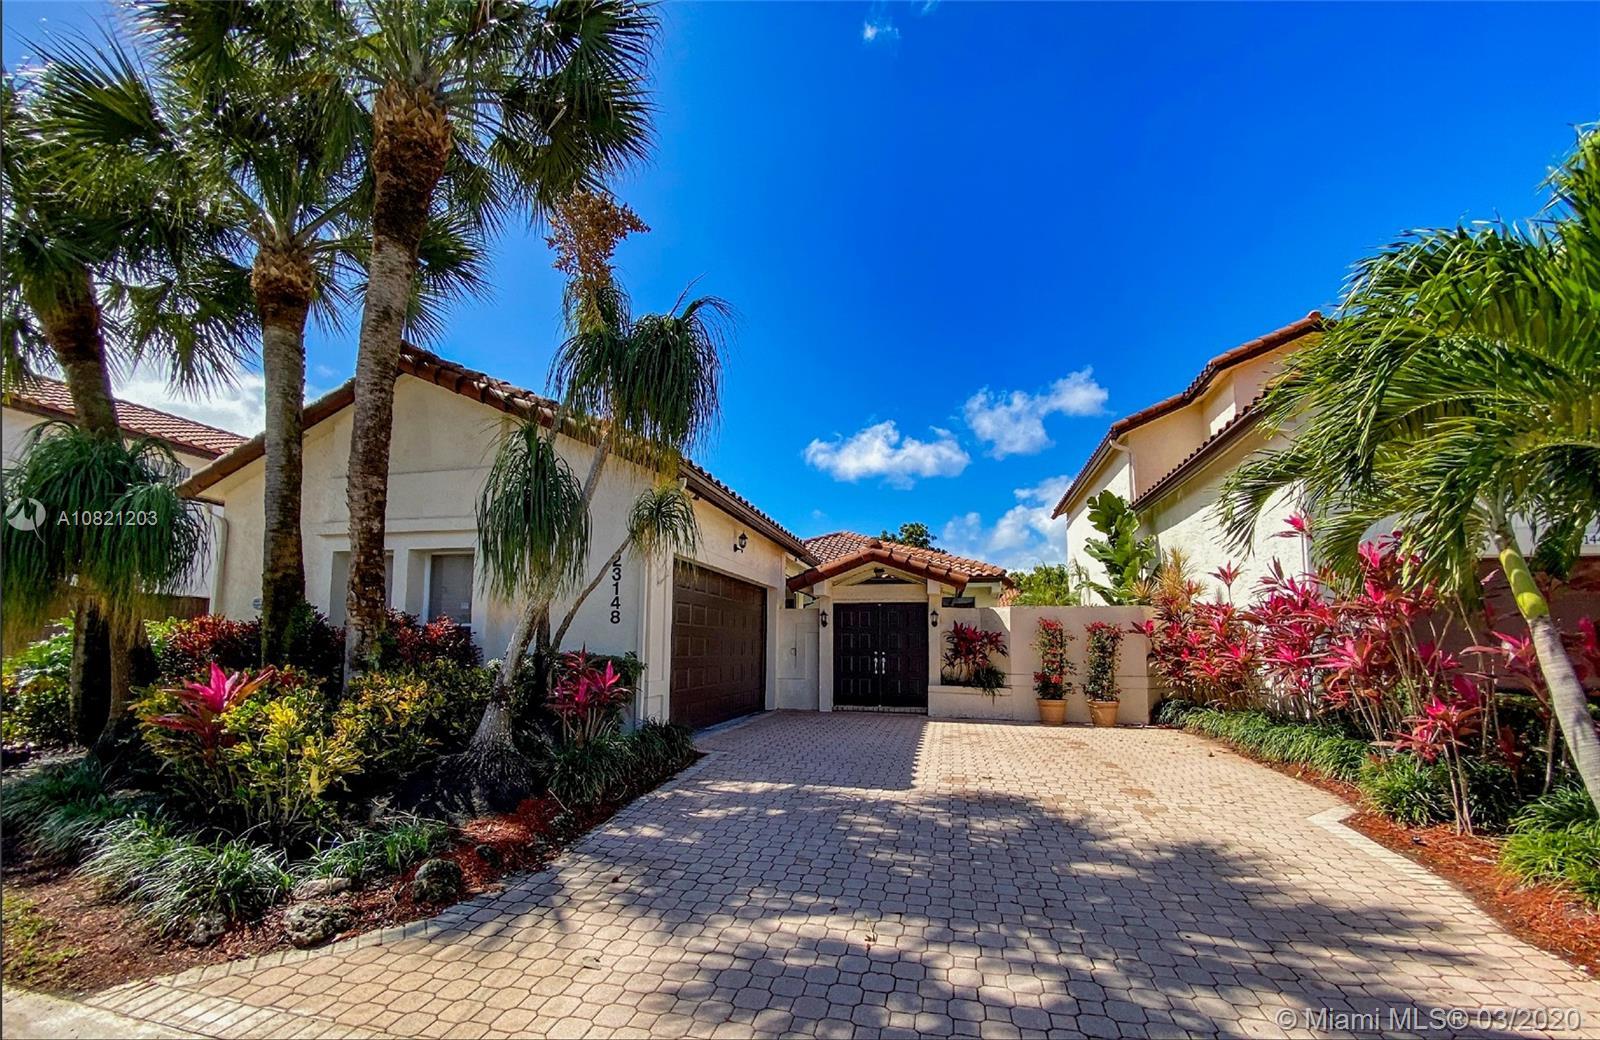 23148 Via Stel, Boca Raton, FL 33433 - Boca Raton, FL real estate listing